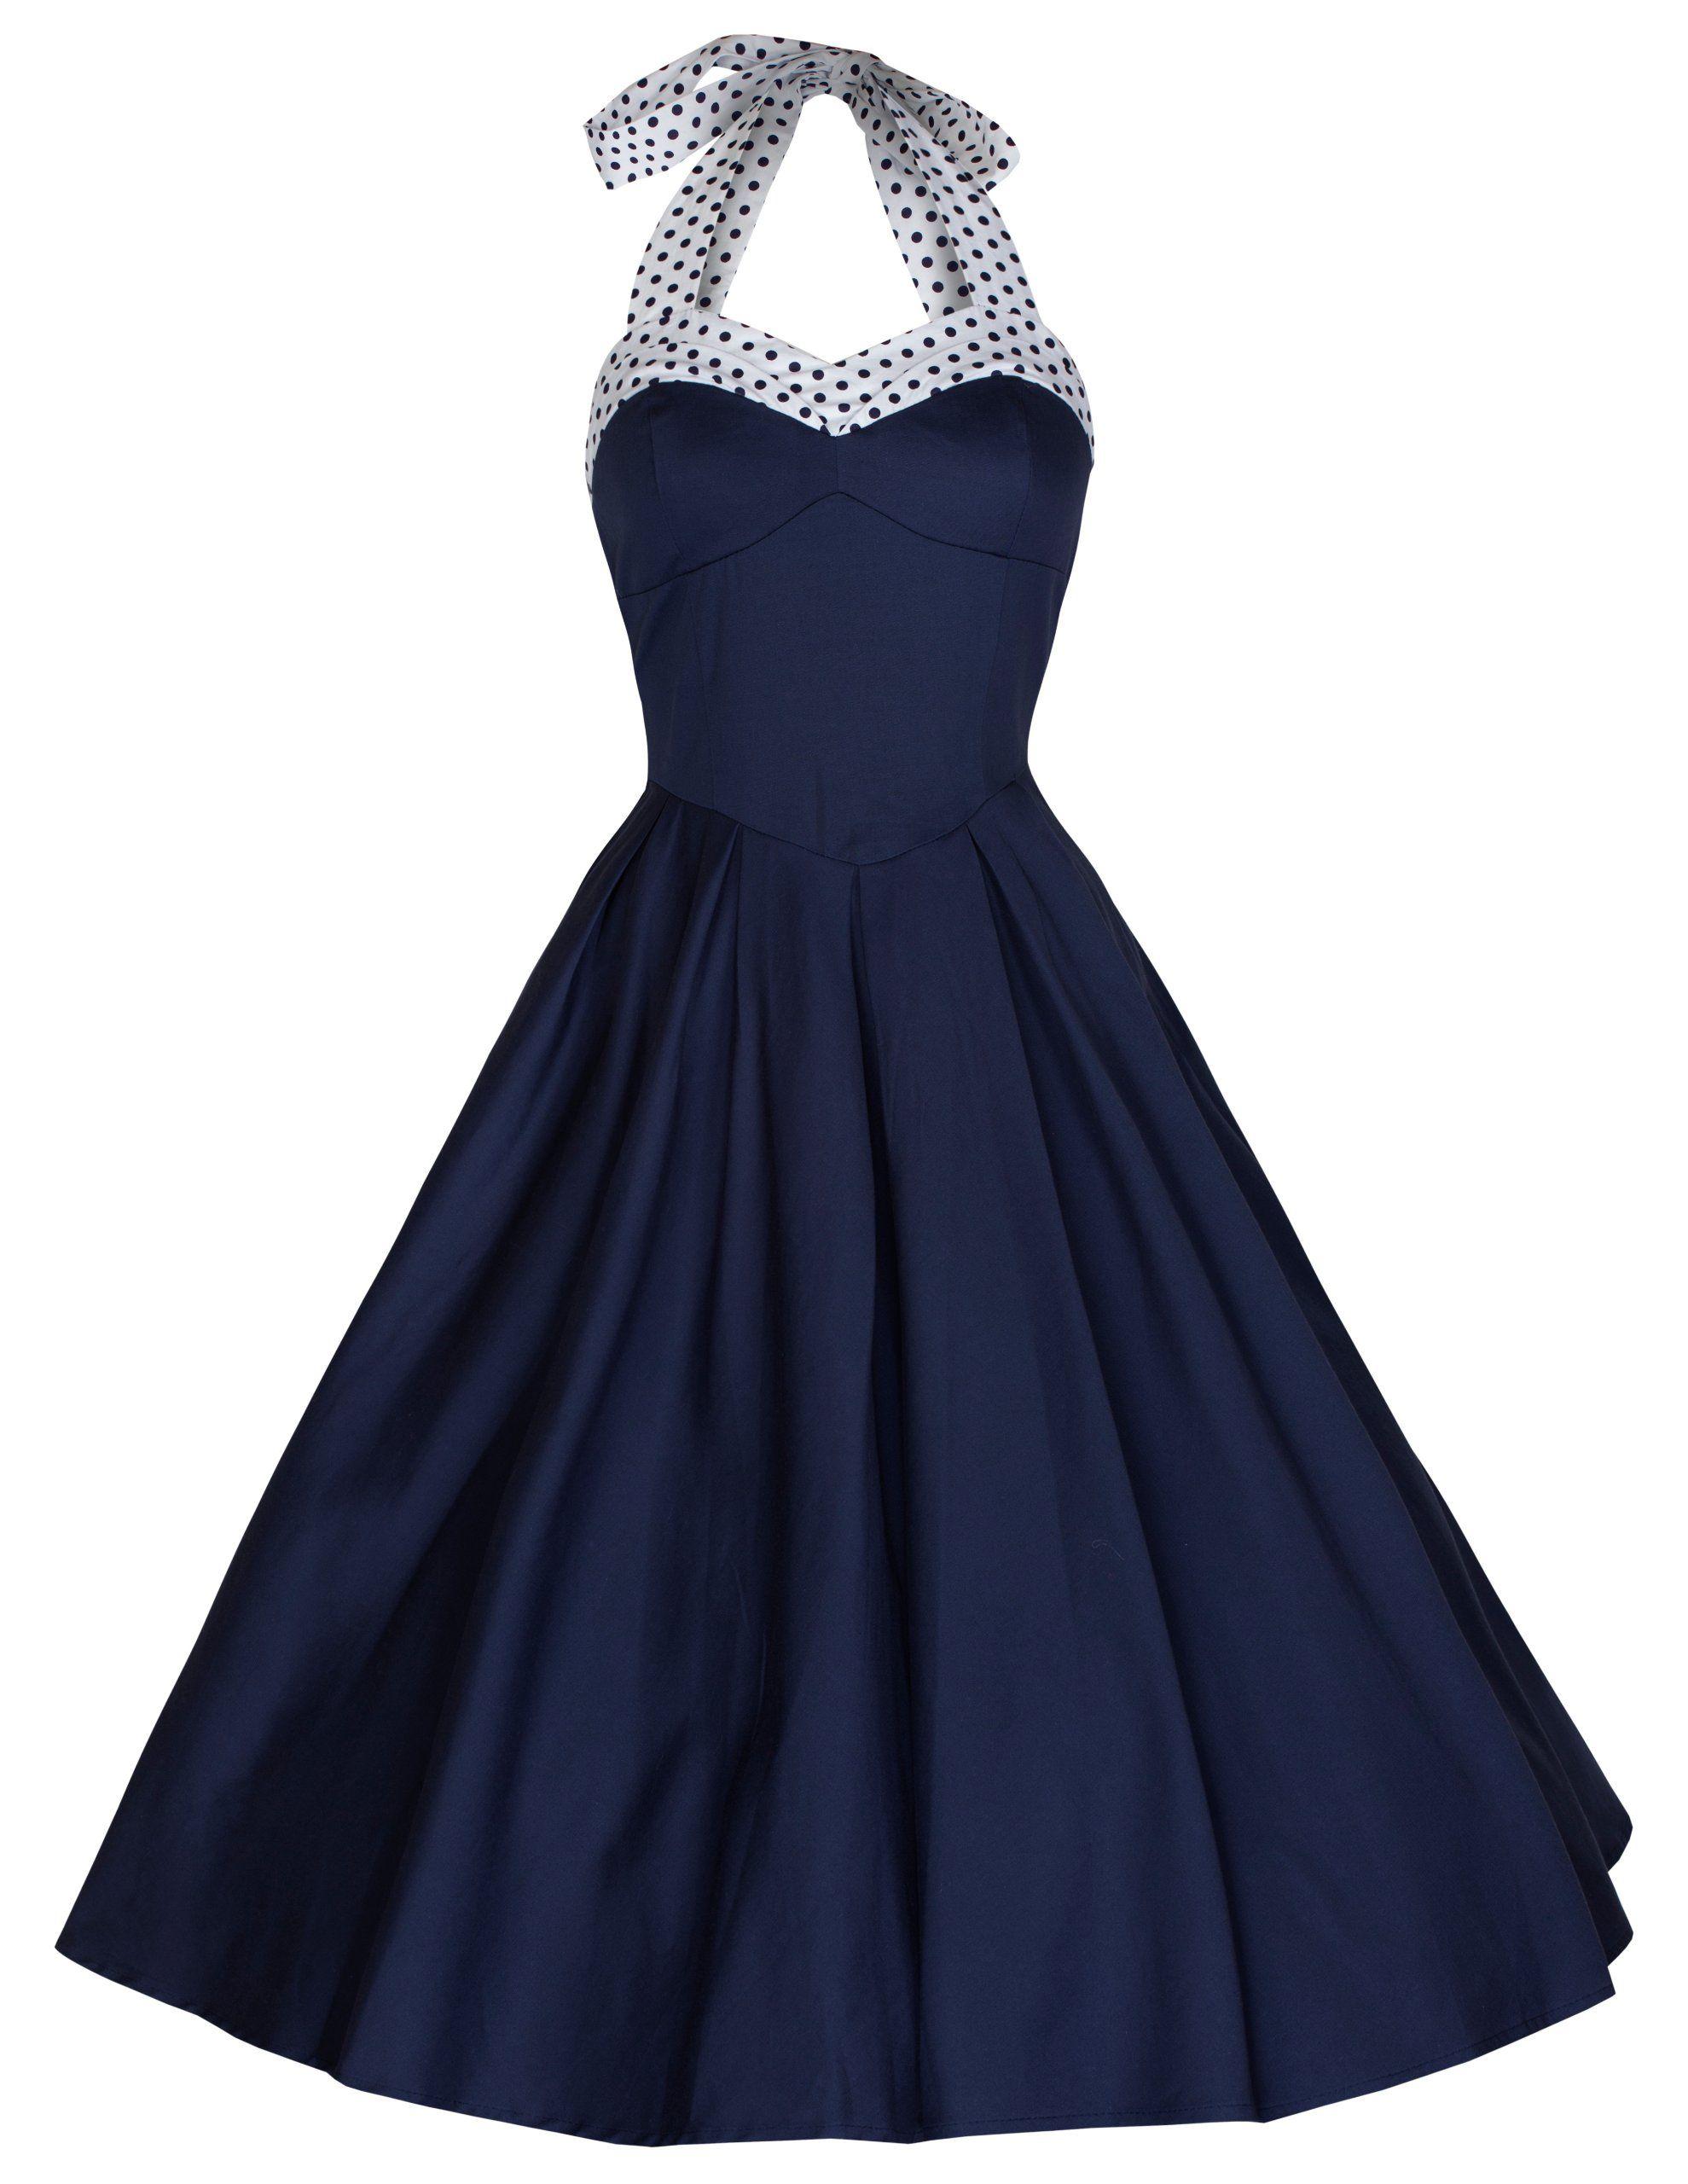 17be6799d196 Lindy Bop Women s  Carola  Vintage 1950 s Rockabilly Halter Neck Swing  Dress (S